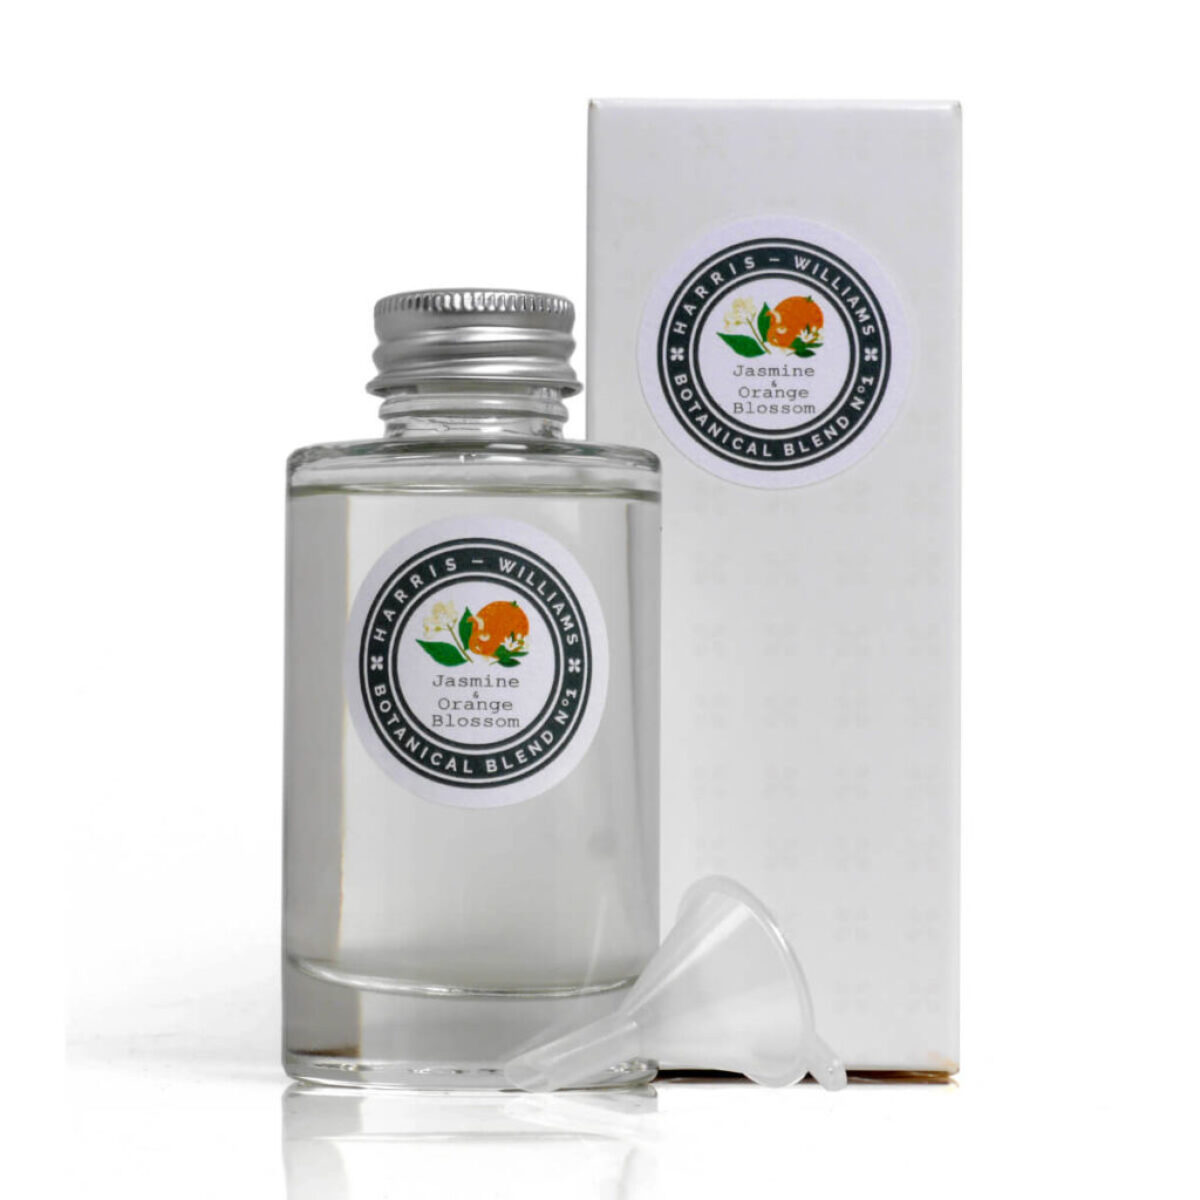 Botanical Blend No 1 Jasmine & Orange Blossom Refill